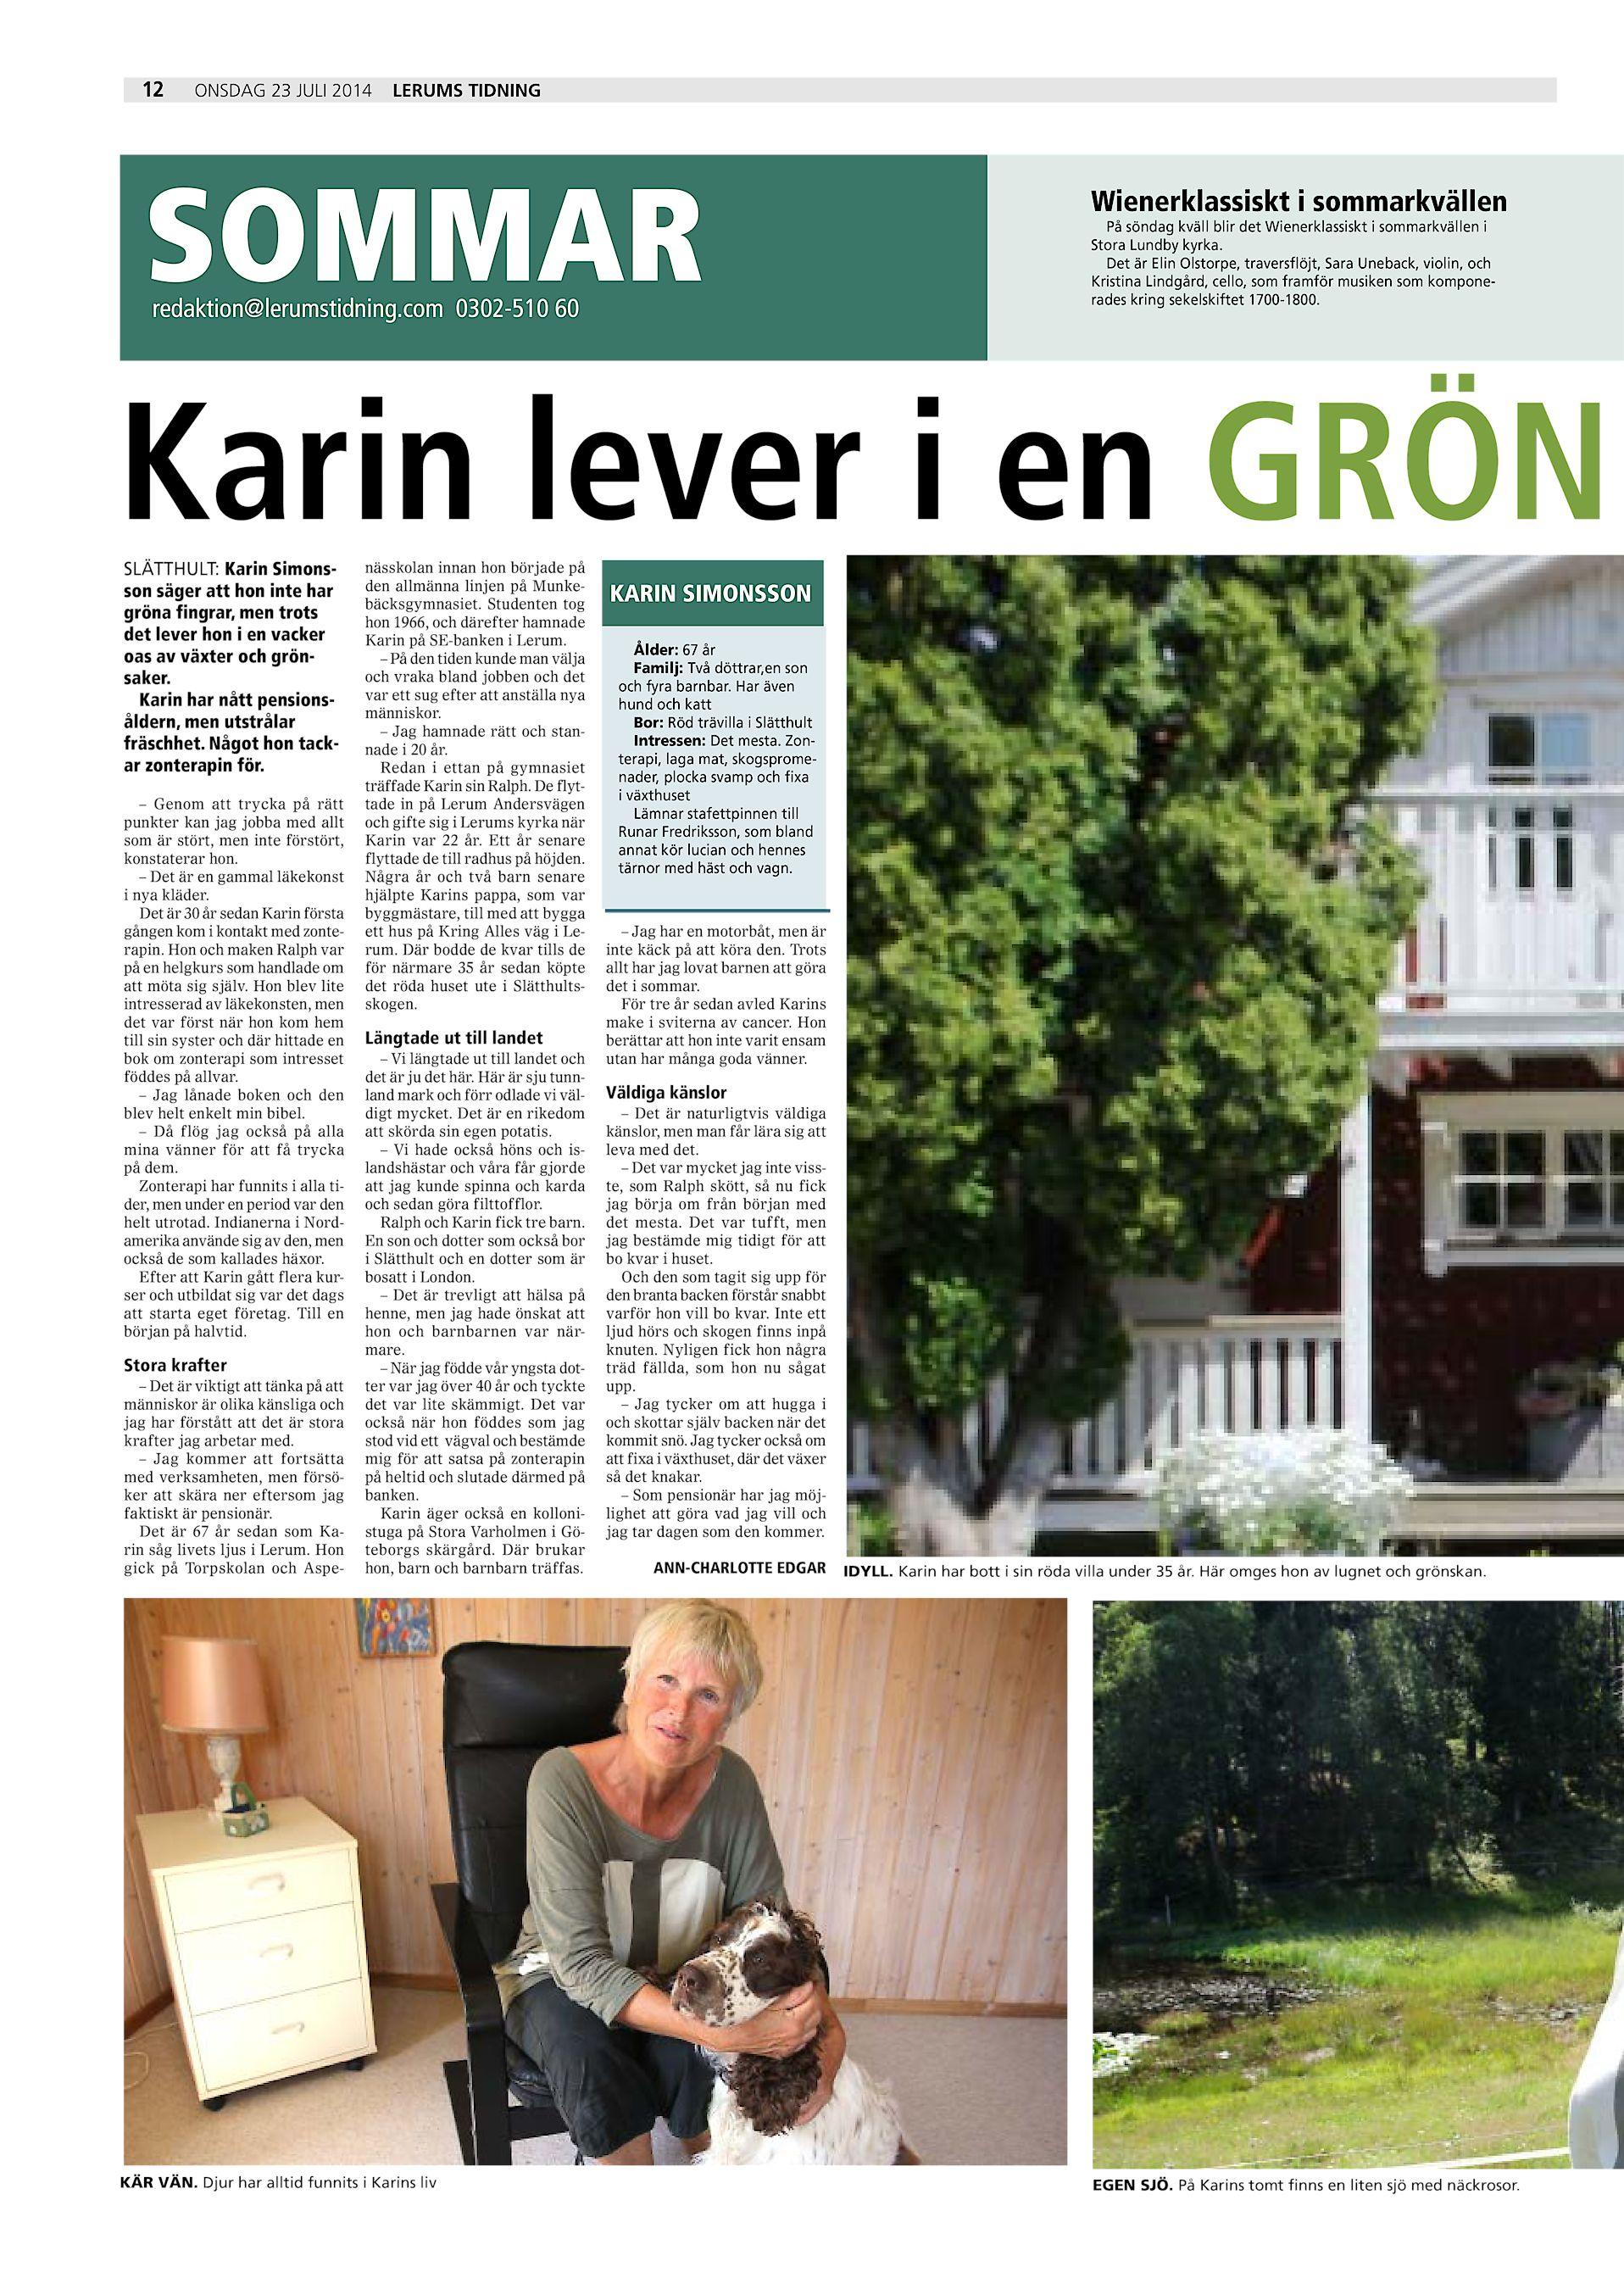 Nazrullah Rezai, Stora Lundby Kyrkvg 4, Grbo   patient-survey.net